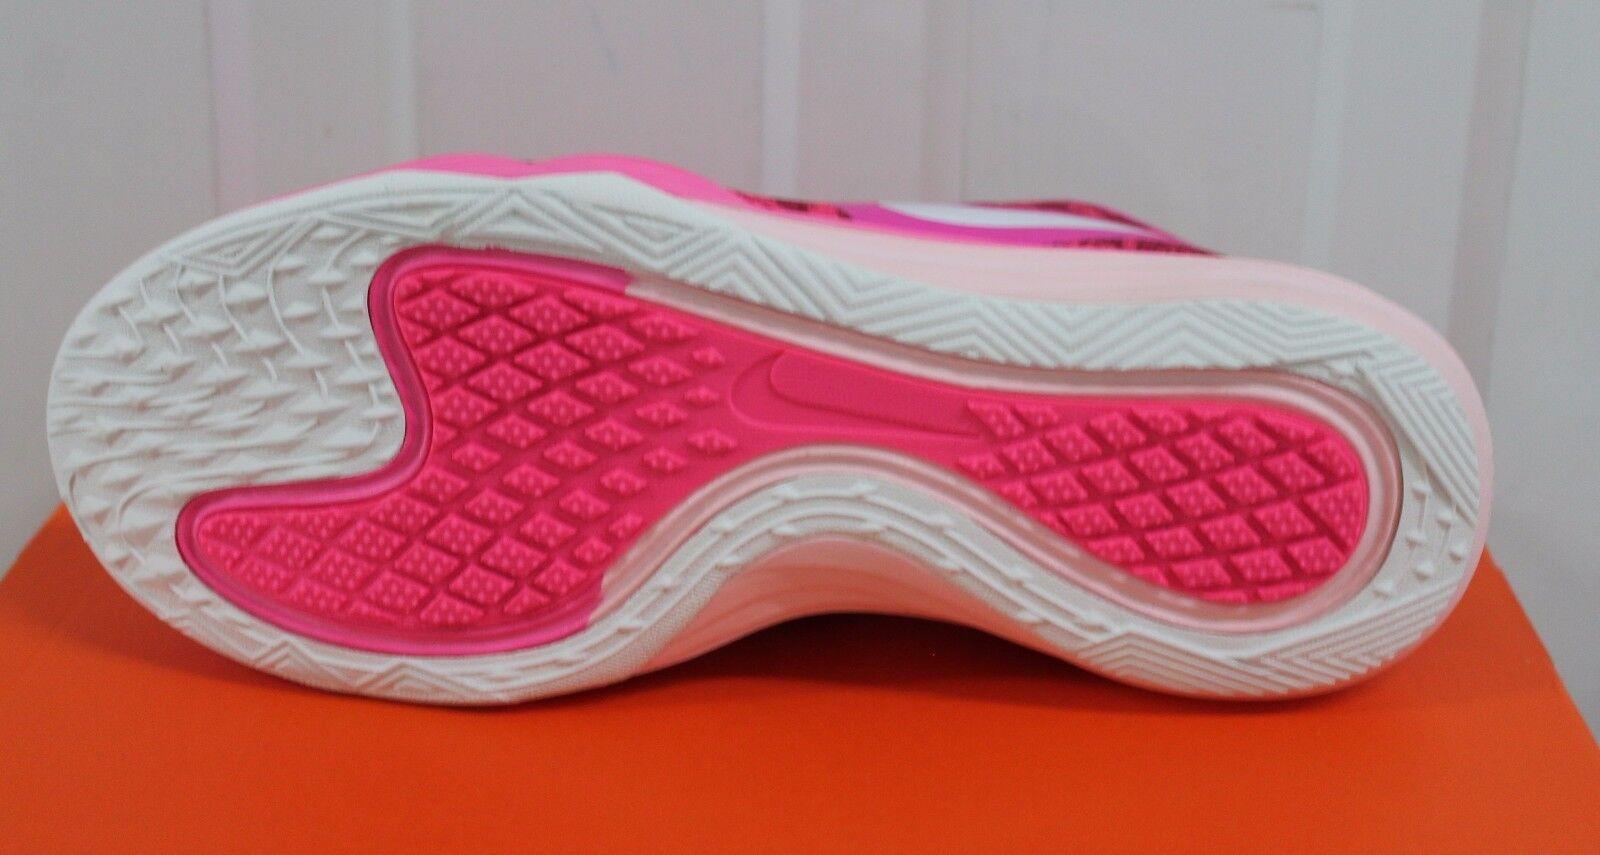 Nike dual fusion tr 3 print lady, s/filles sz... sz... s/filles 3,5... 4... 4,5... 5,5... 6... neuf 22215 f4a22a